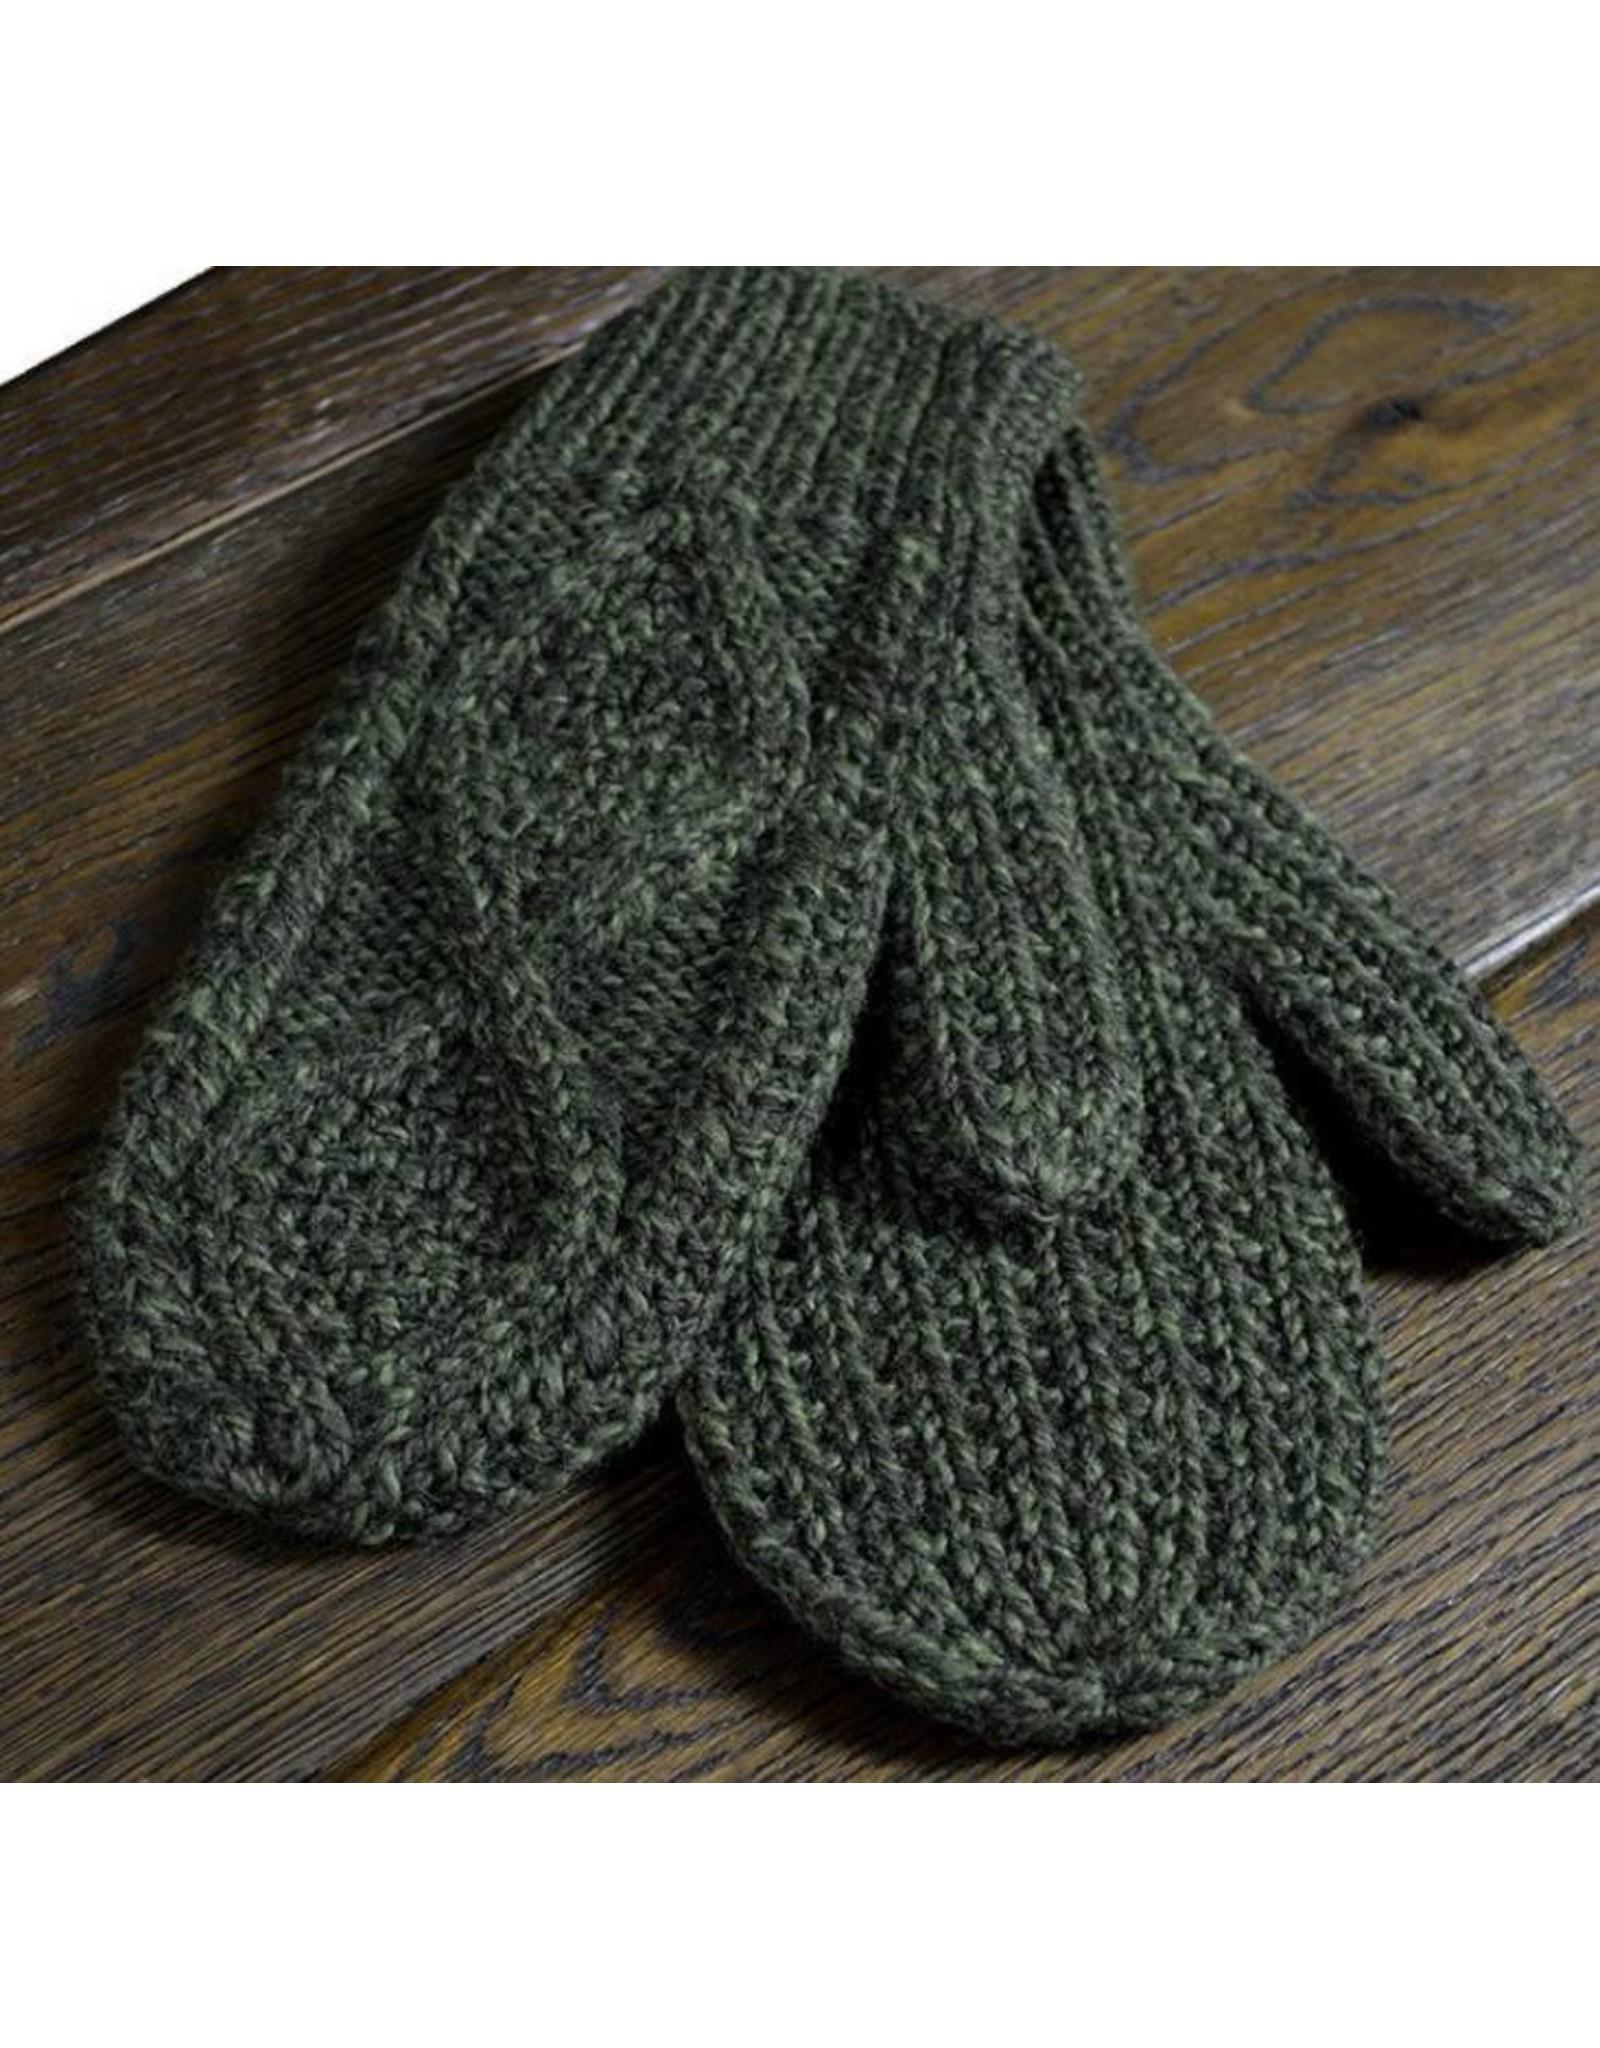 Aran Woollen Mills Handknit Aran Wool Mittens